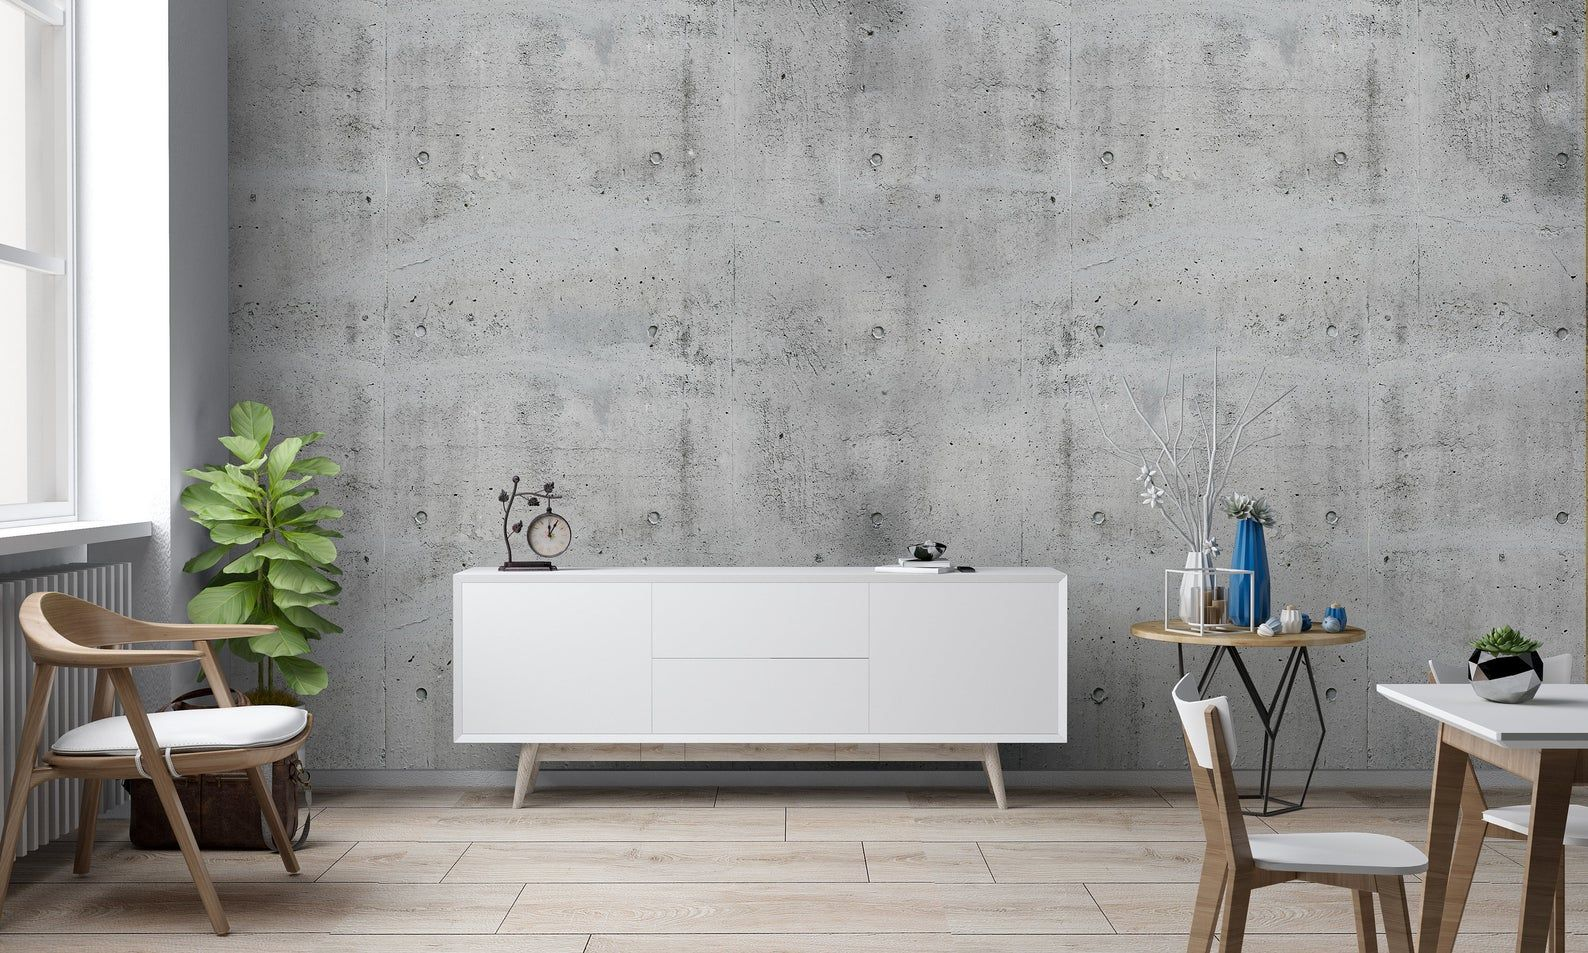 Concrete Grey Fibreglass Wallpaper To Measure Wall Art Etsy In 2020 Wall Tiles Living Room Grey Wallpaper Concrete Wallpaper